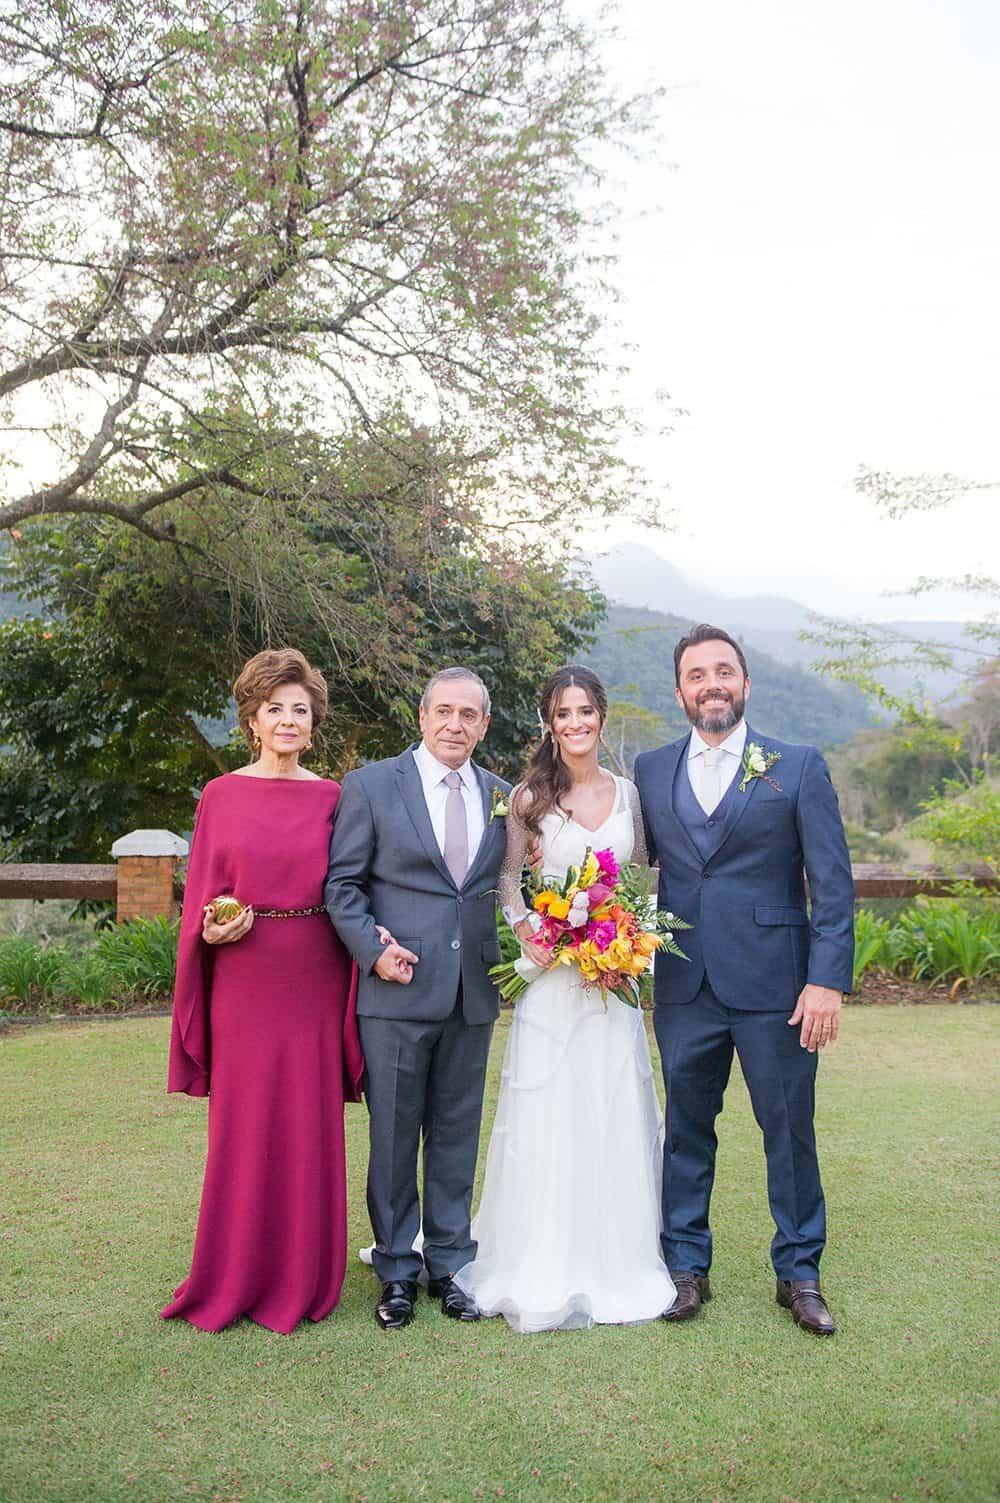 casamento-isadora-e-breno-caseme-foto-marina-fava-fotografia-20